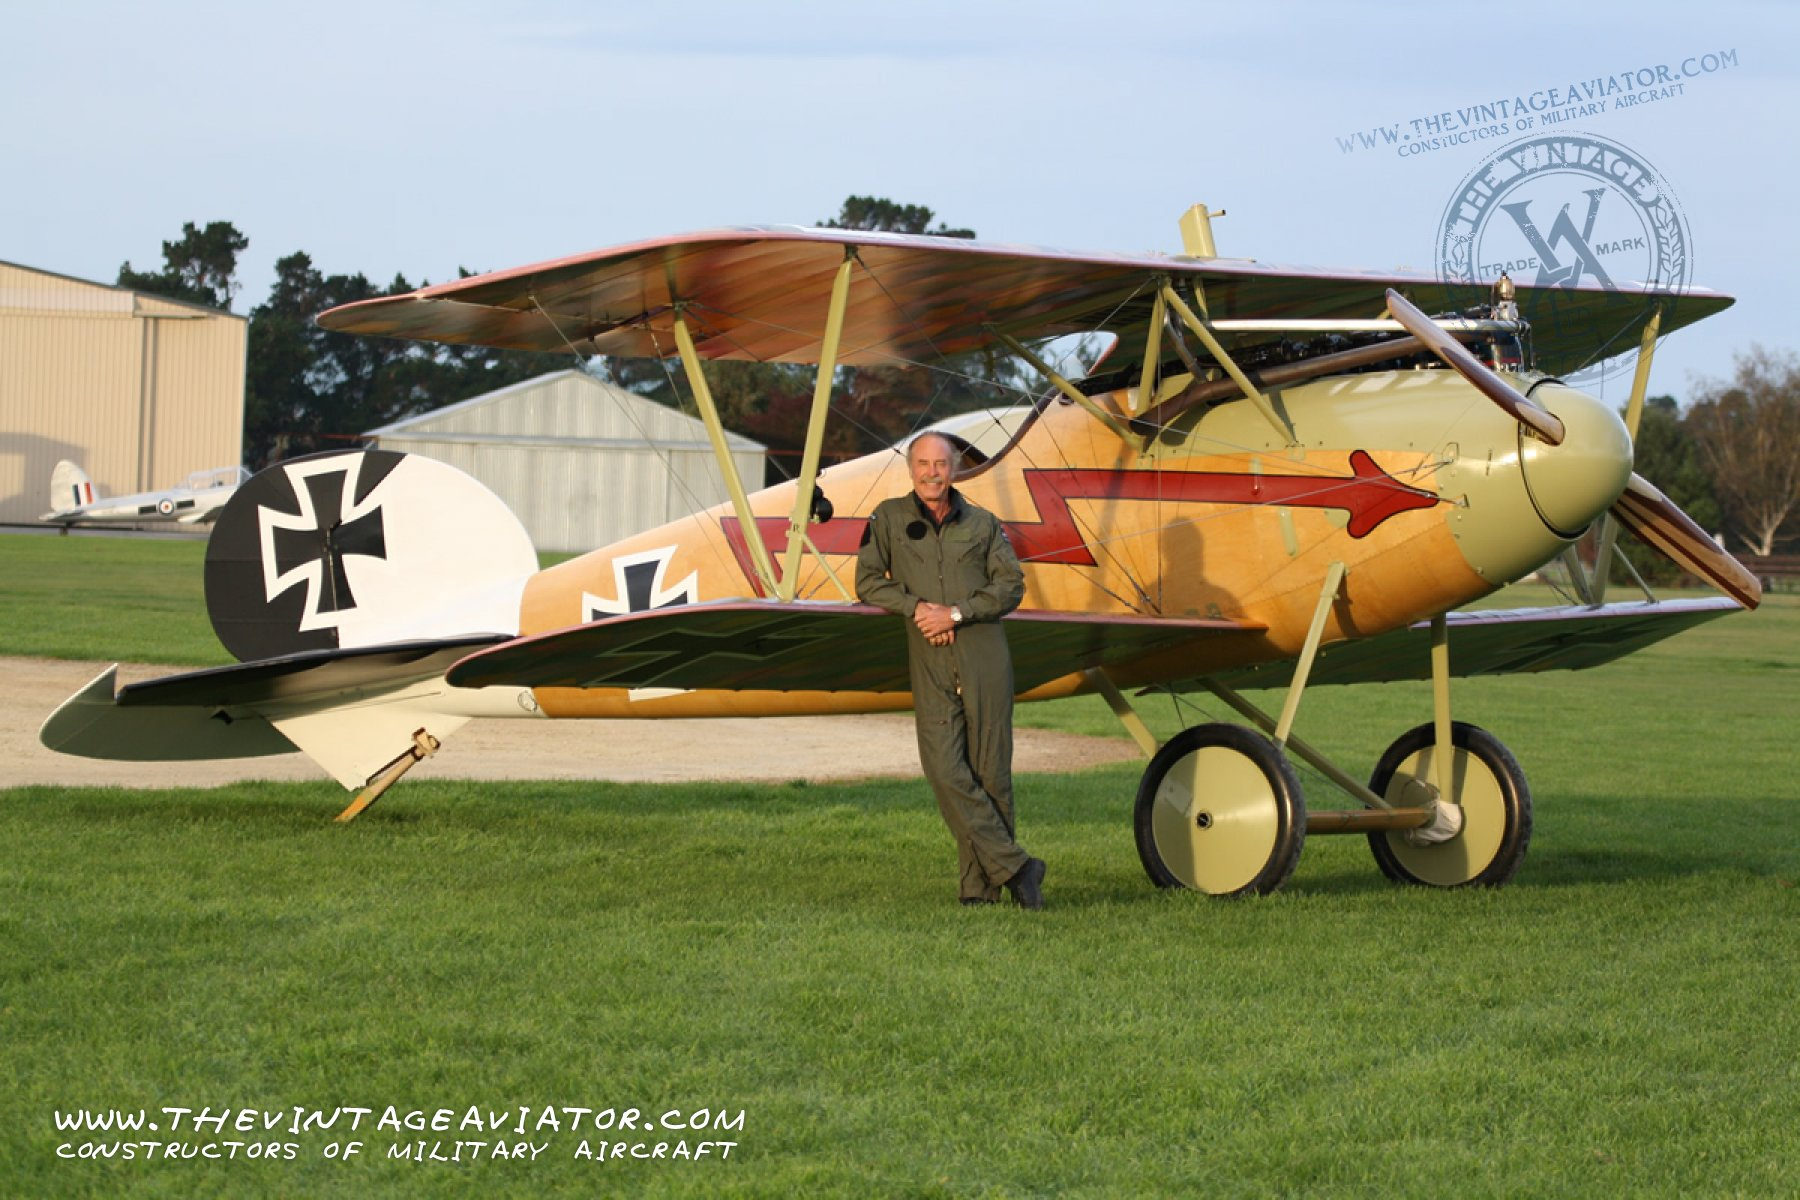 Creating A New Albatros The Vintage Aviator